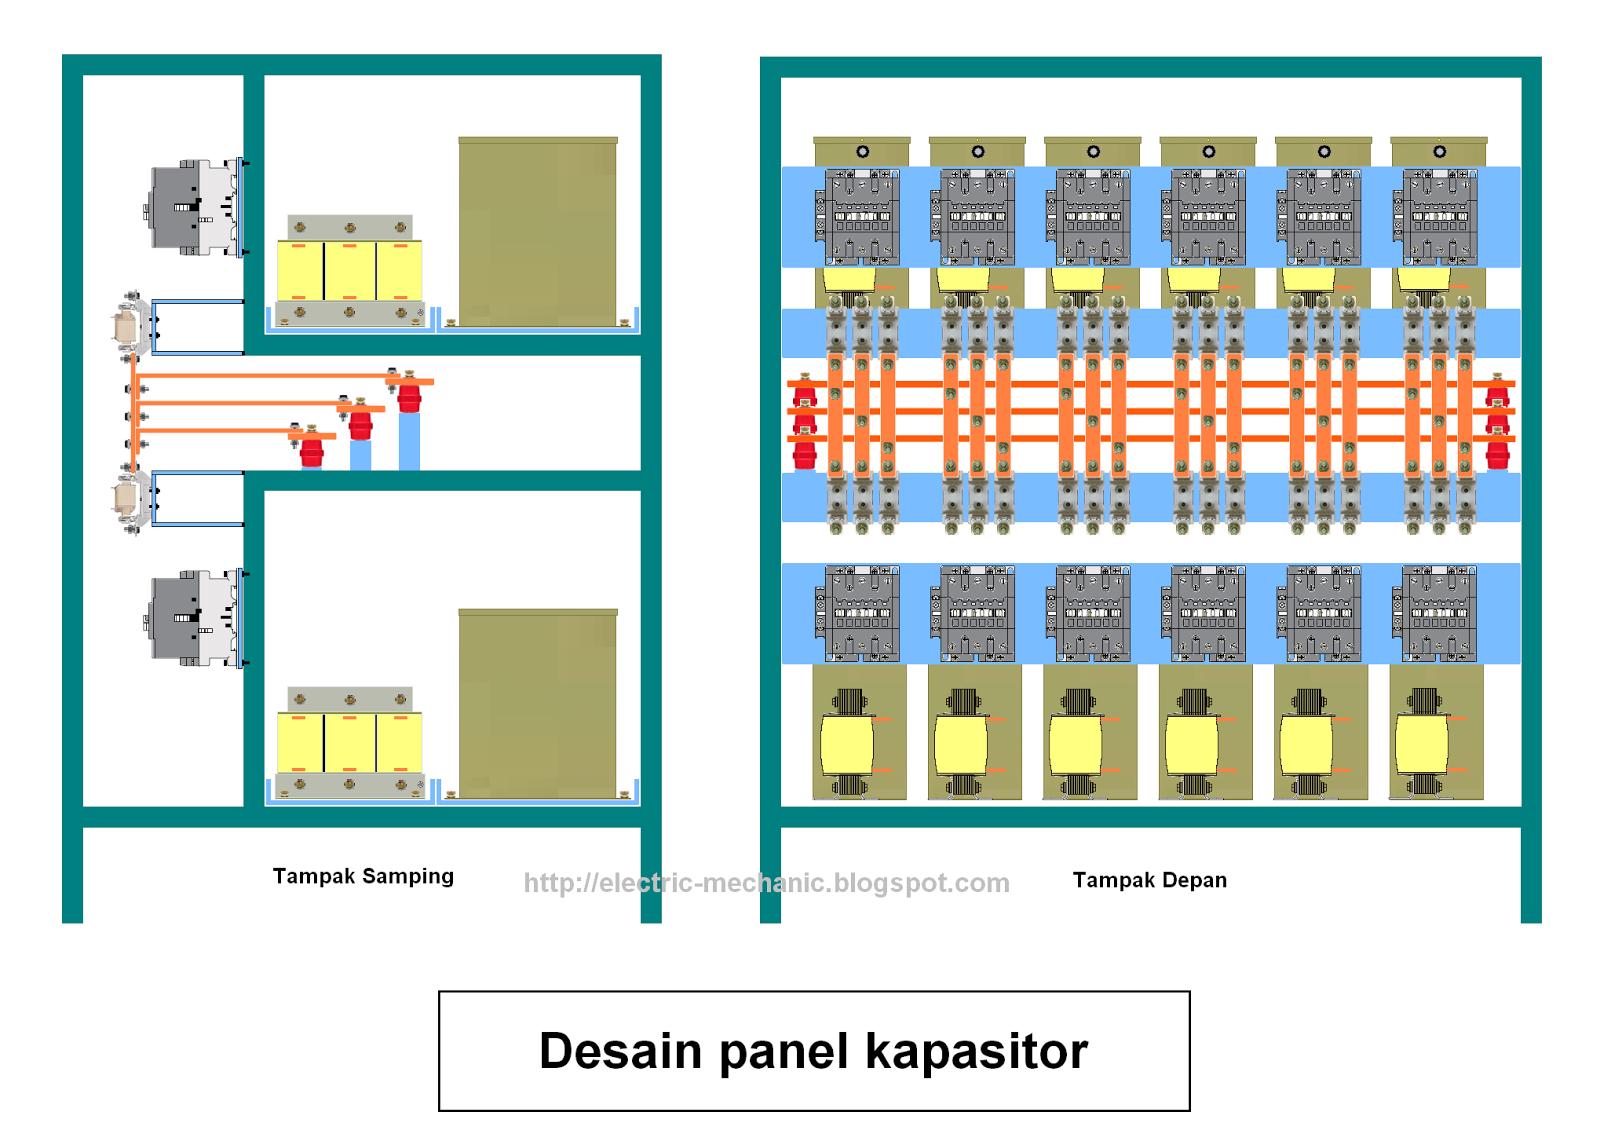 [DIAGRAM_4PO]  A4B7C8 Wiring Diagram Panel Capacitor Bank | Wiring Resources | Wiring Diagram Panel Kapasitor |  | Wiring Resources